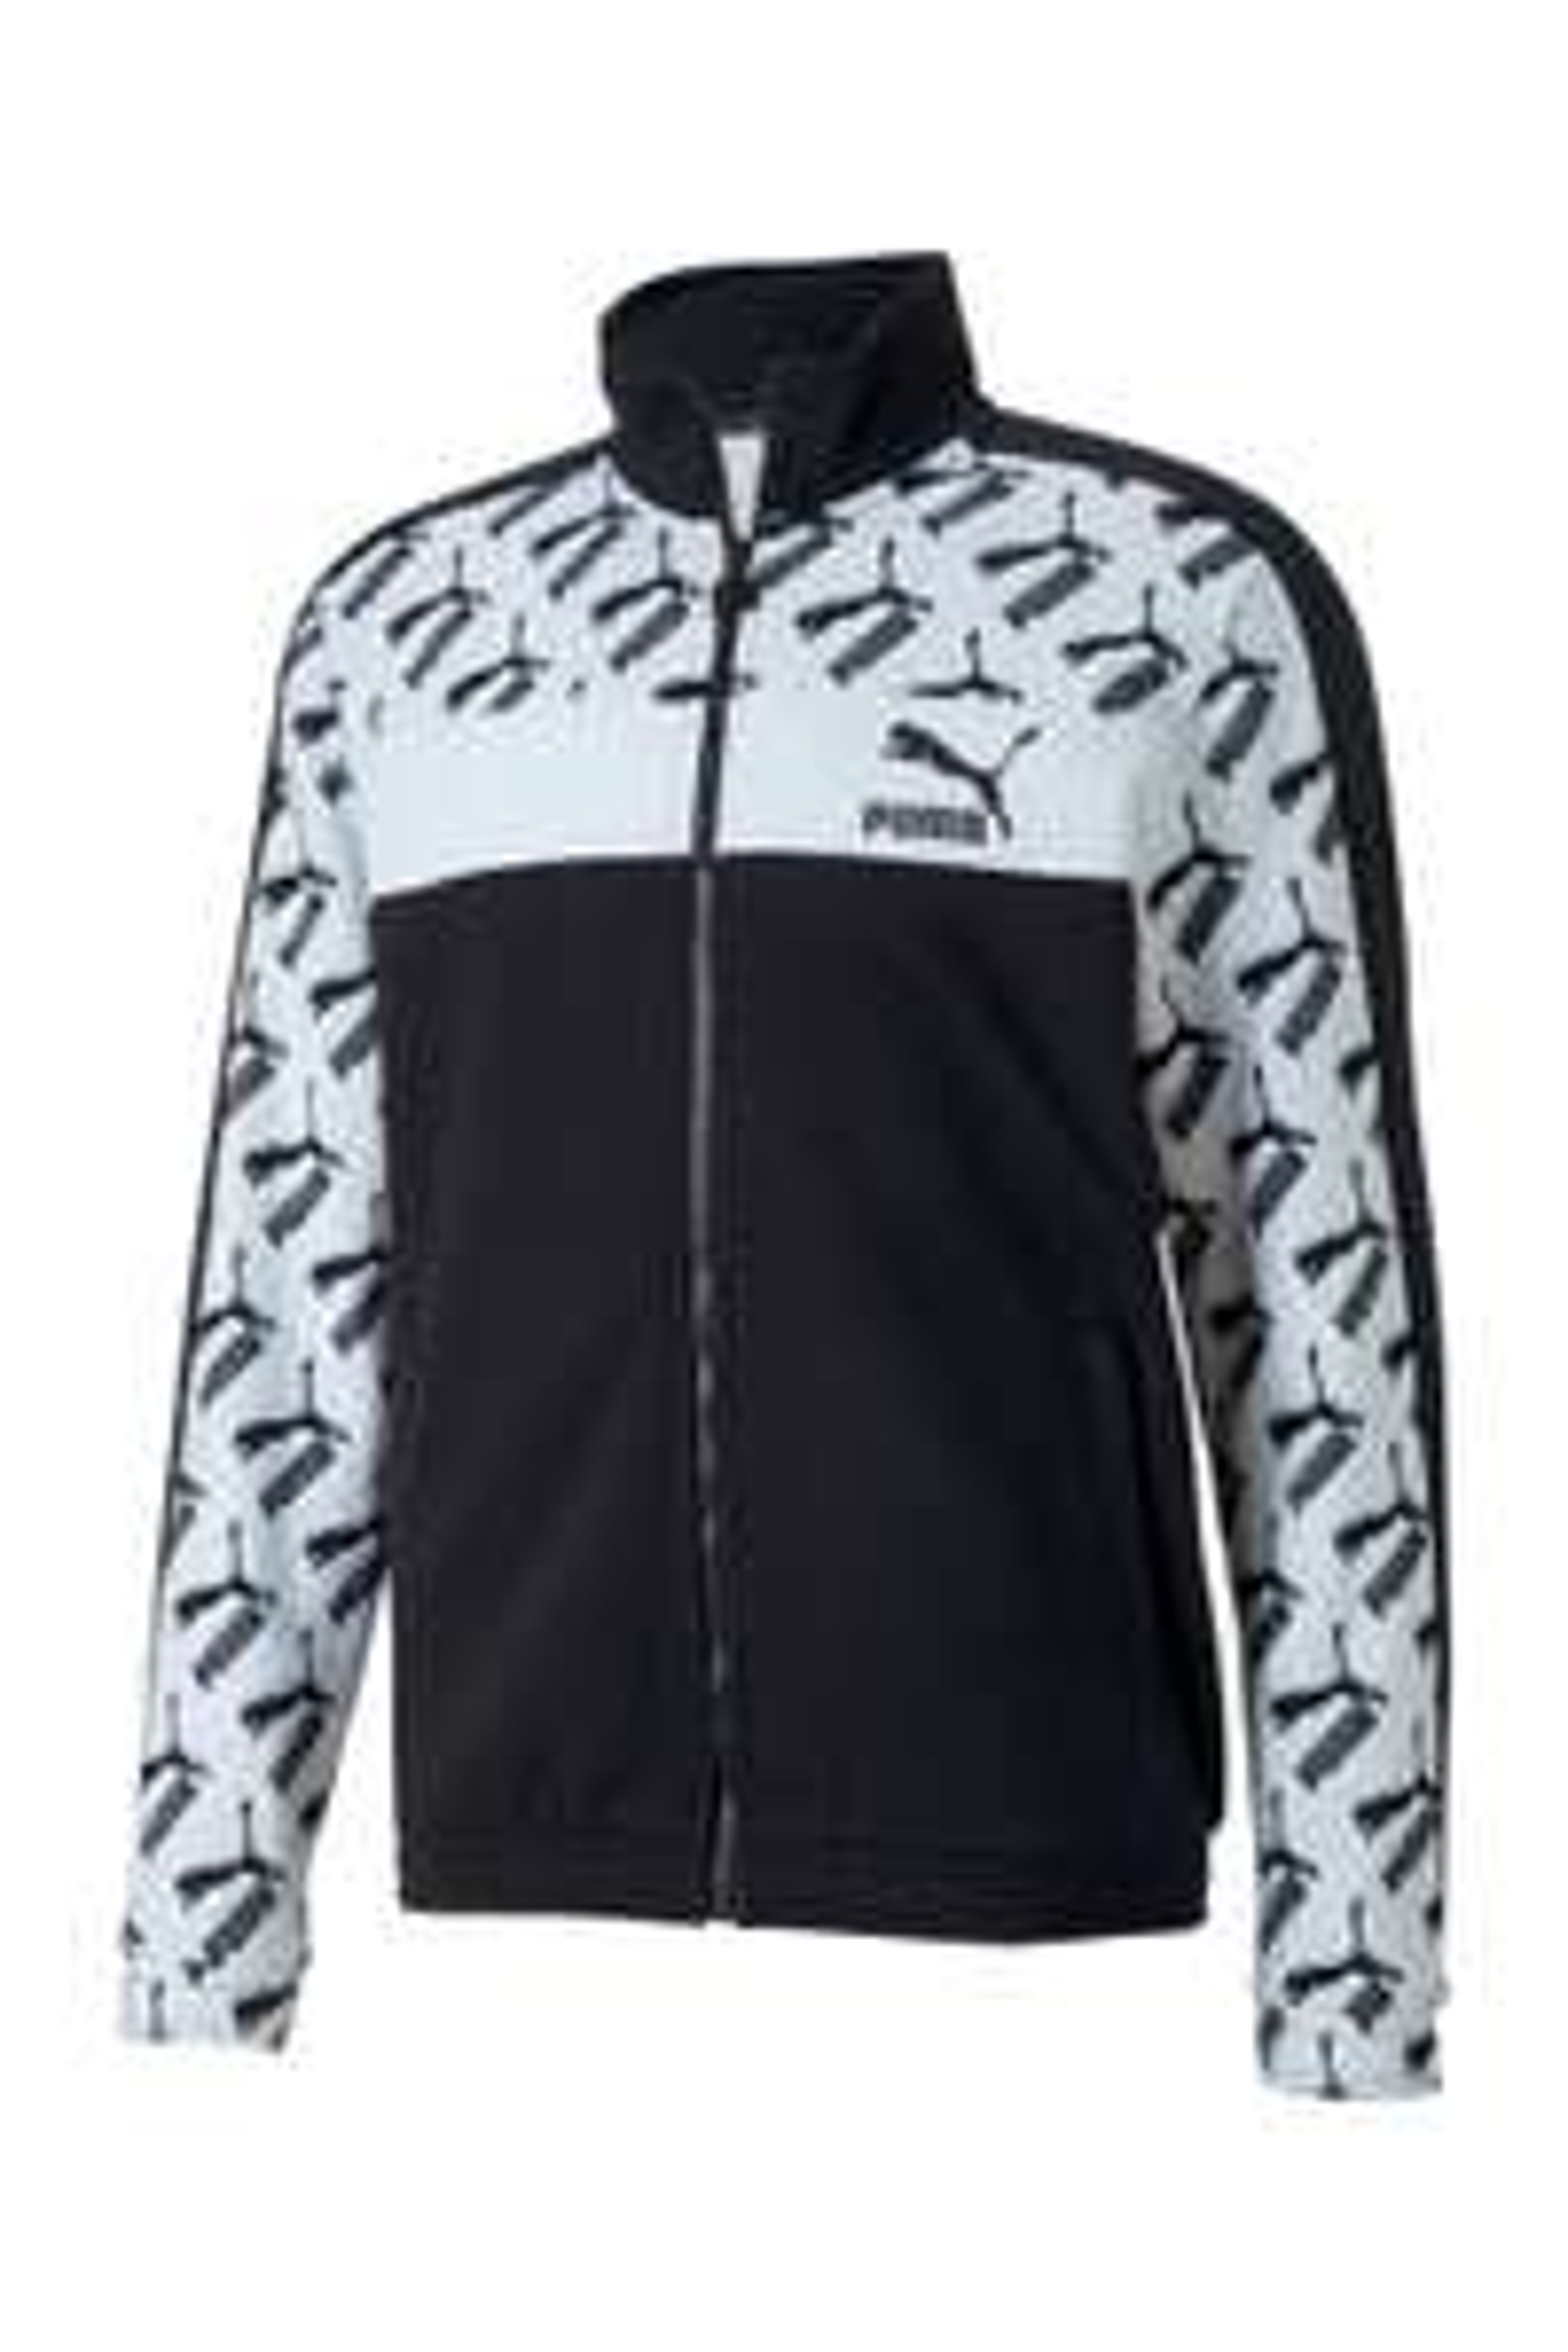 Puma vest met zwart witte logoprint [L + XL] @ Wehkamp